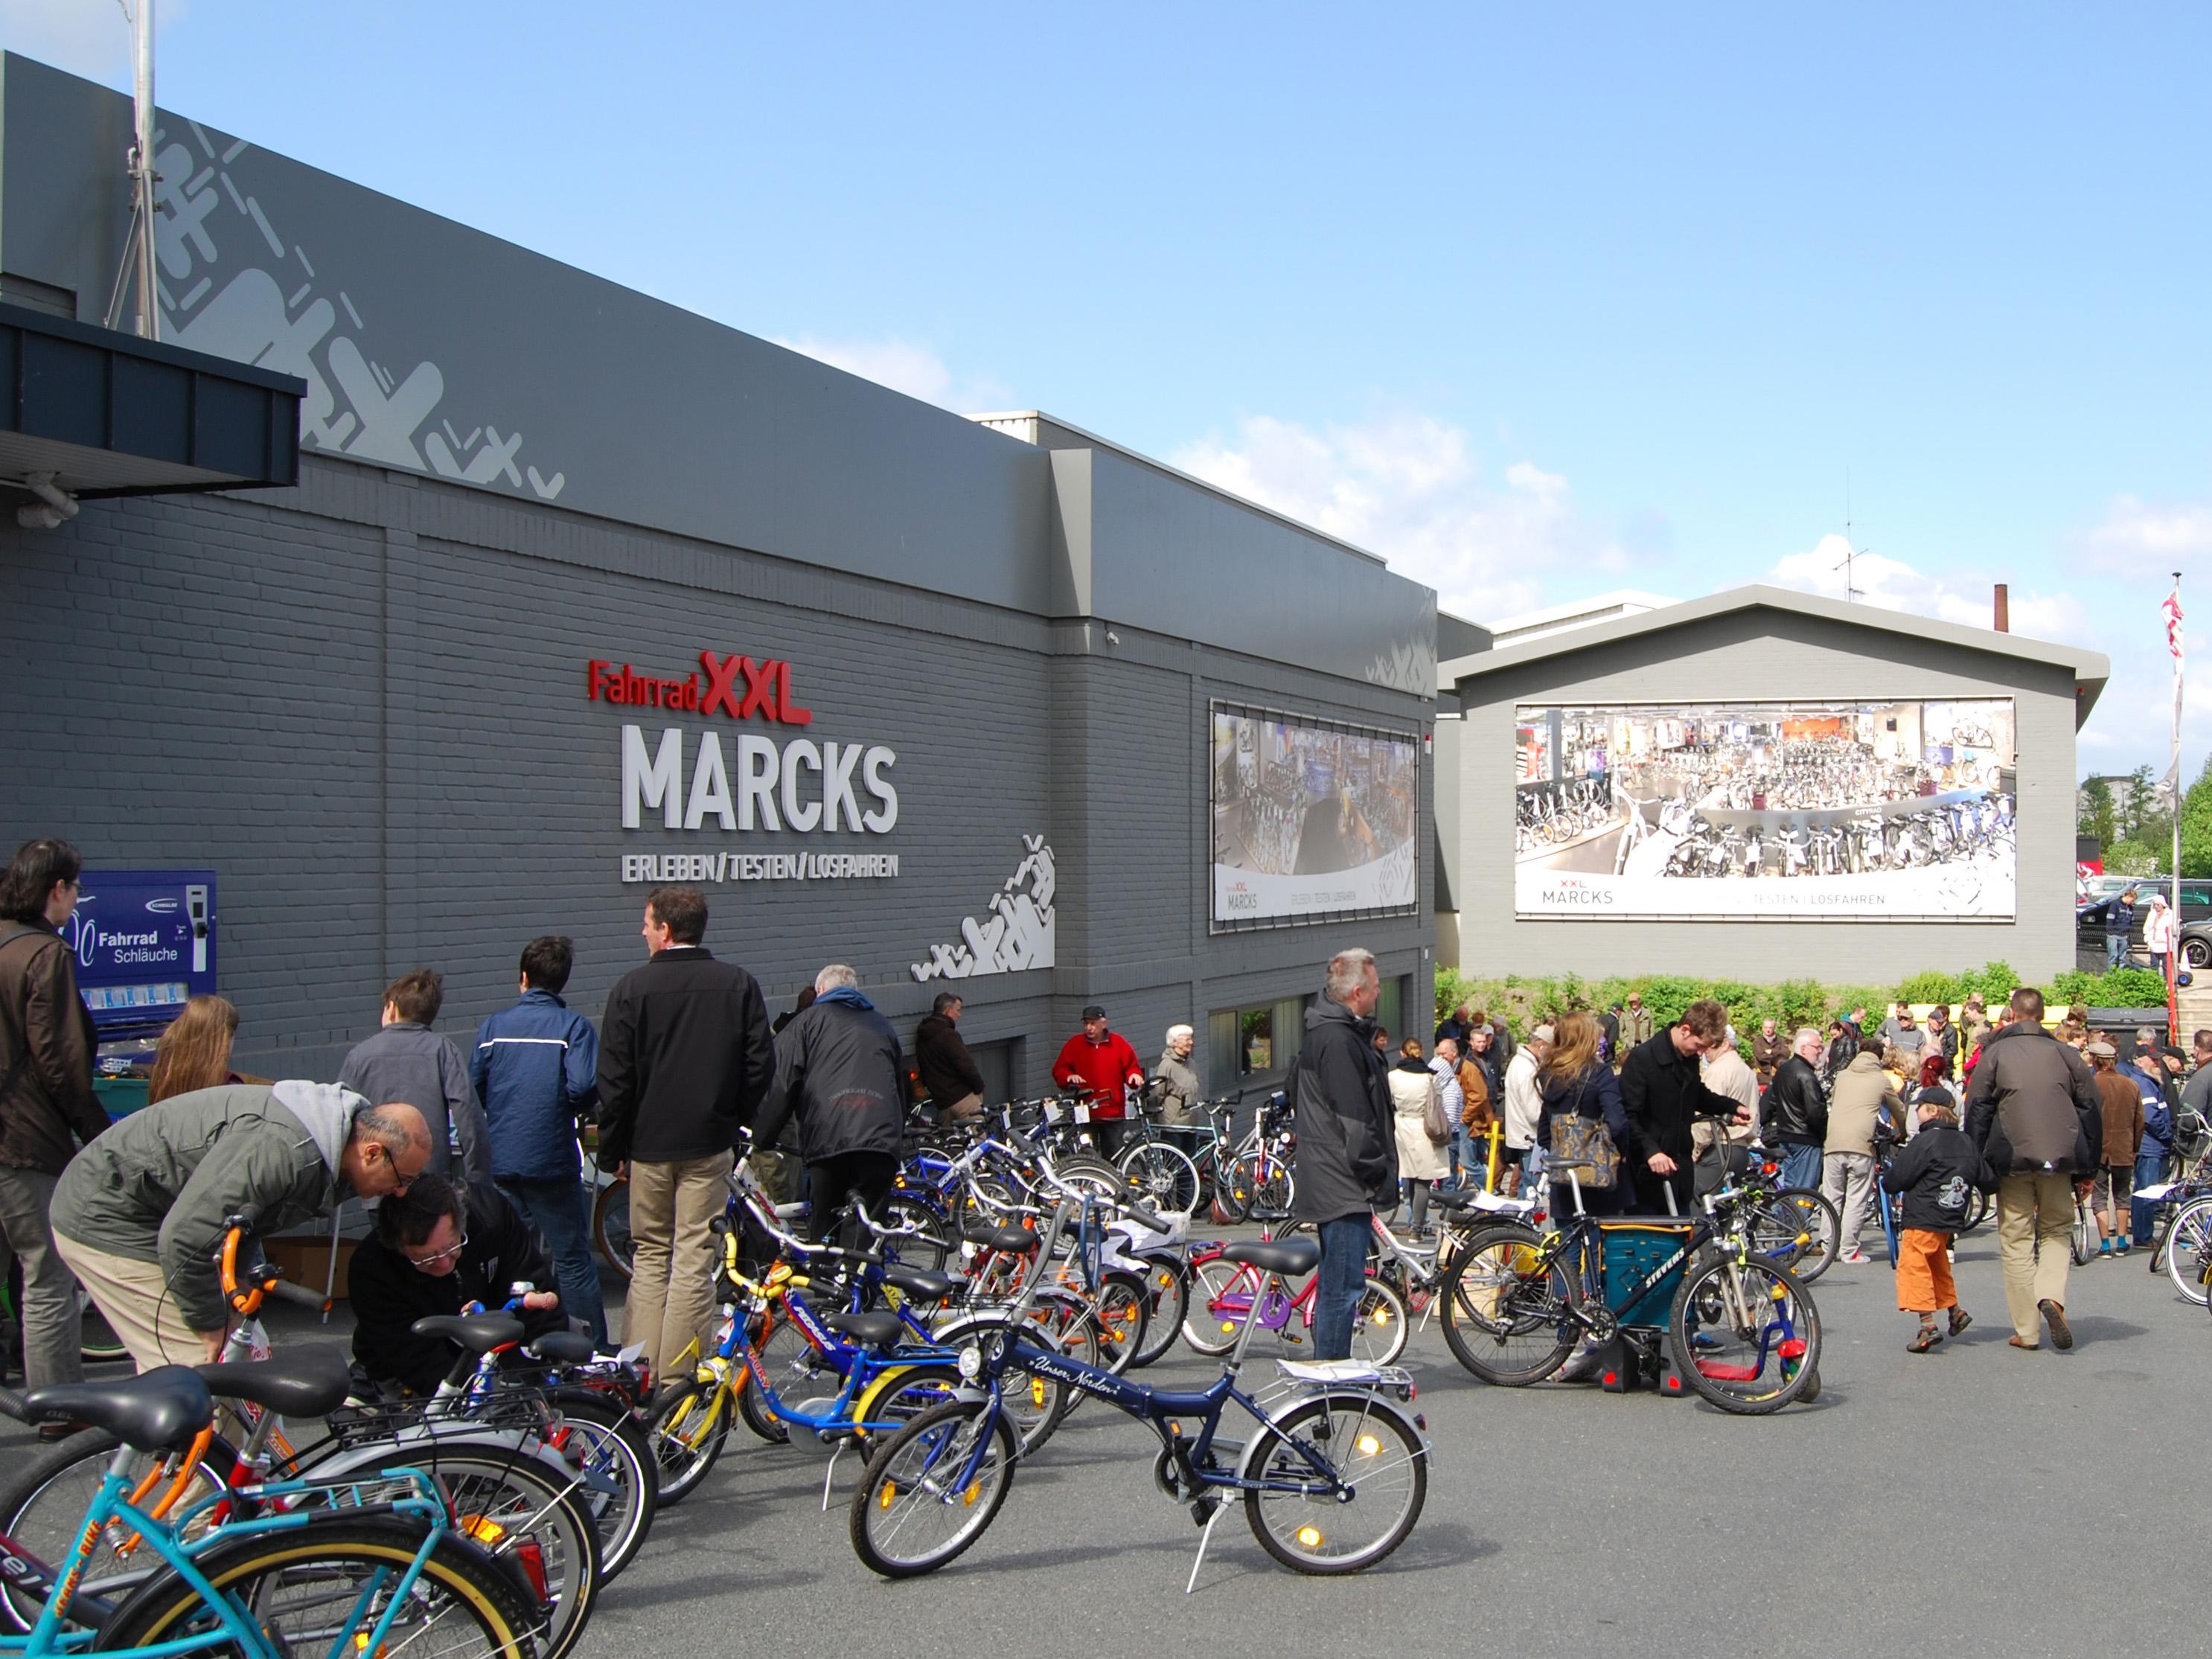 MARCKS GmbH